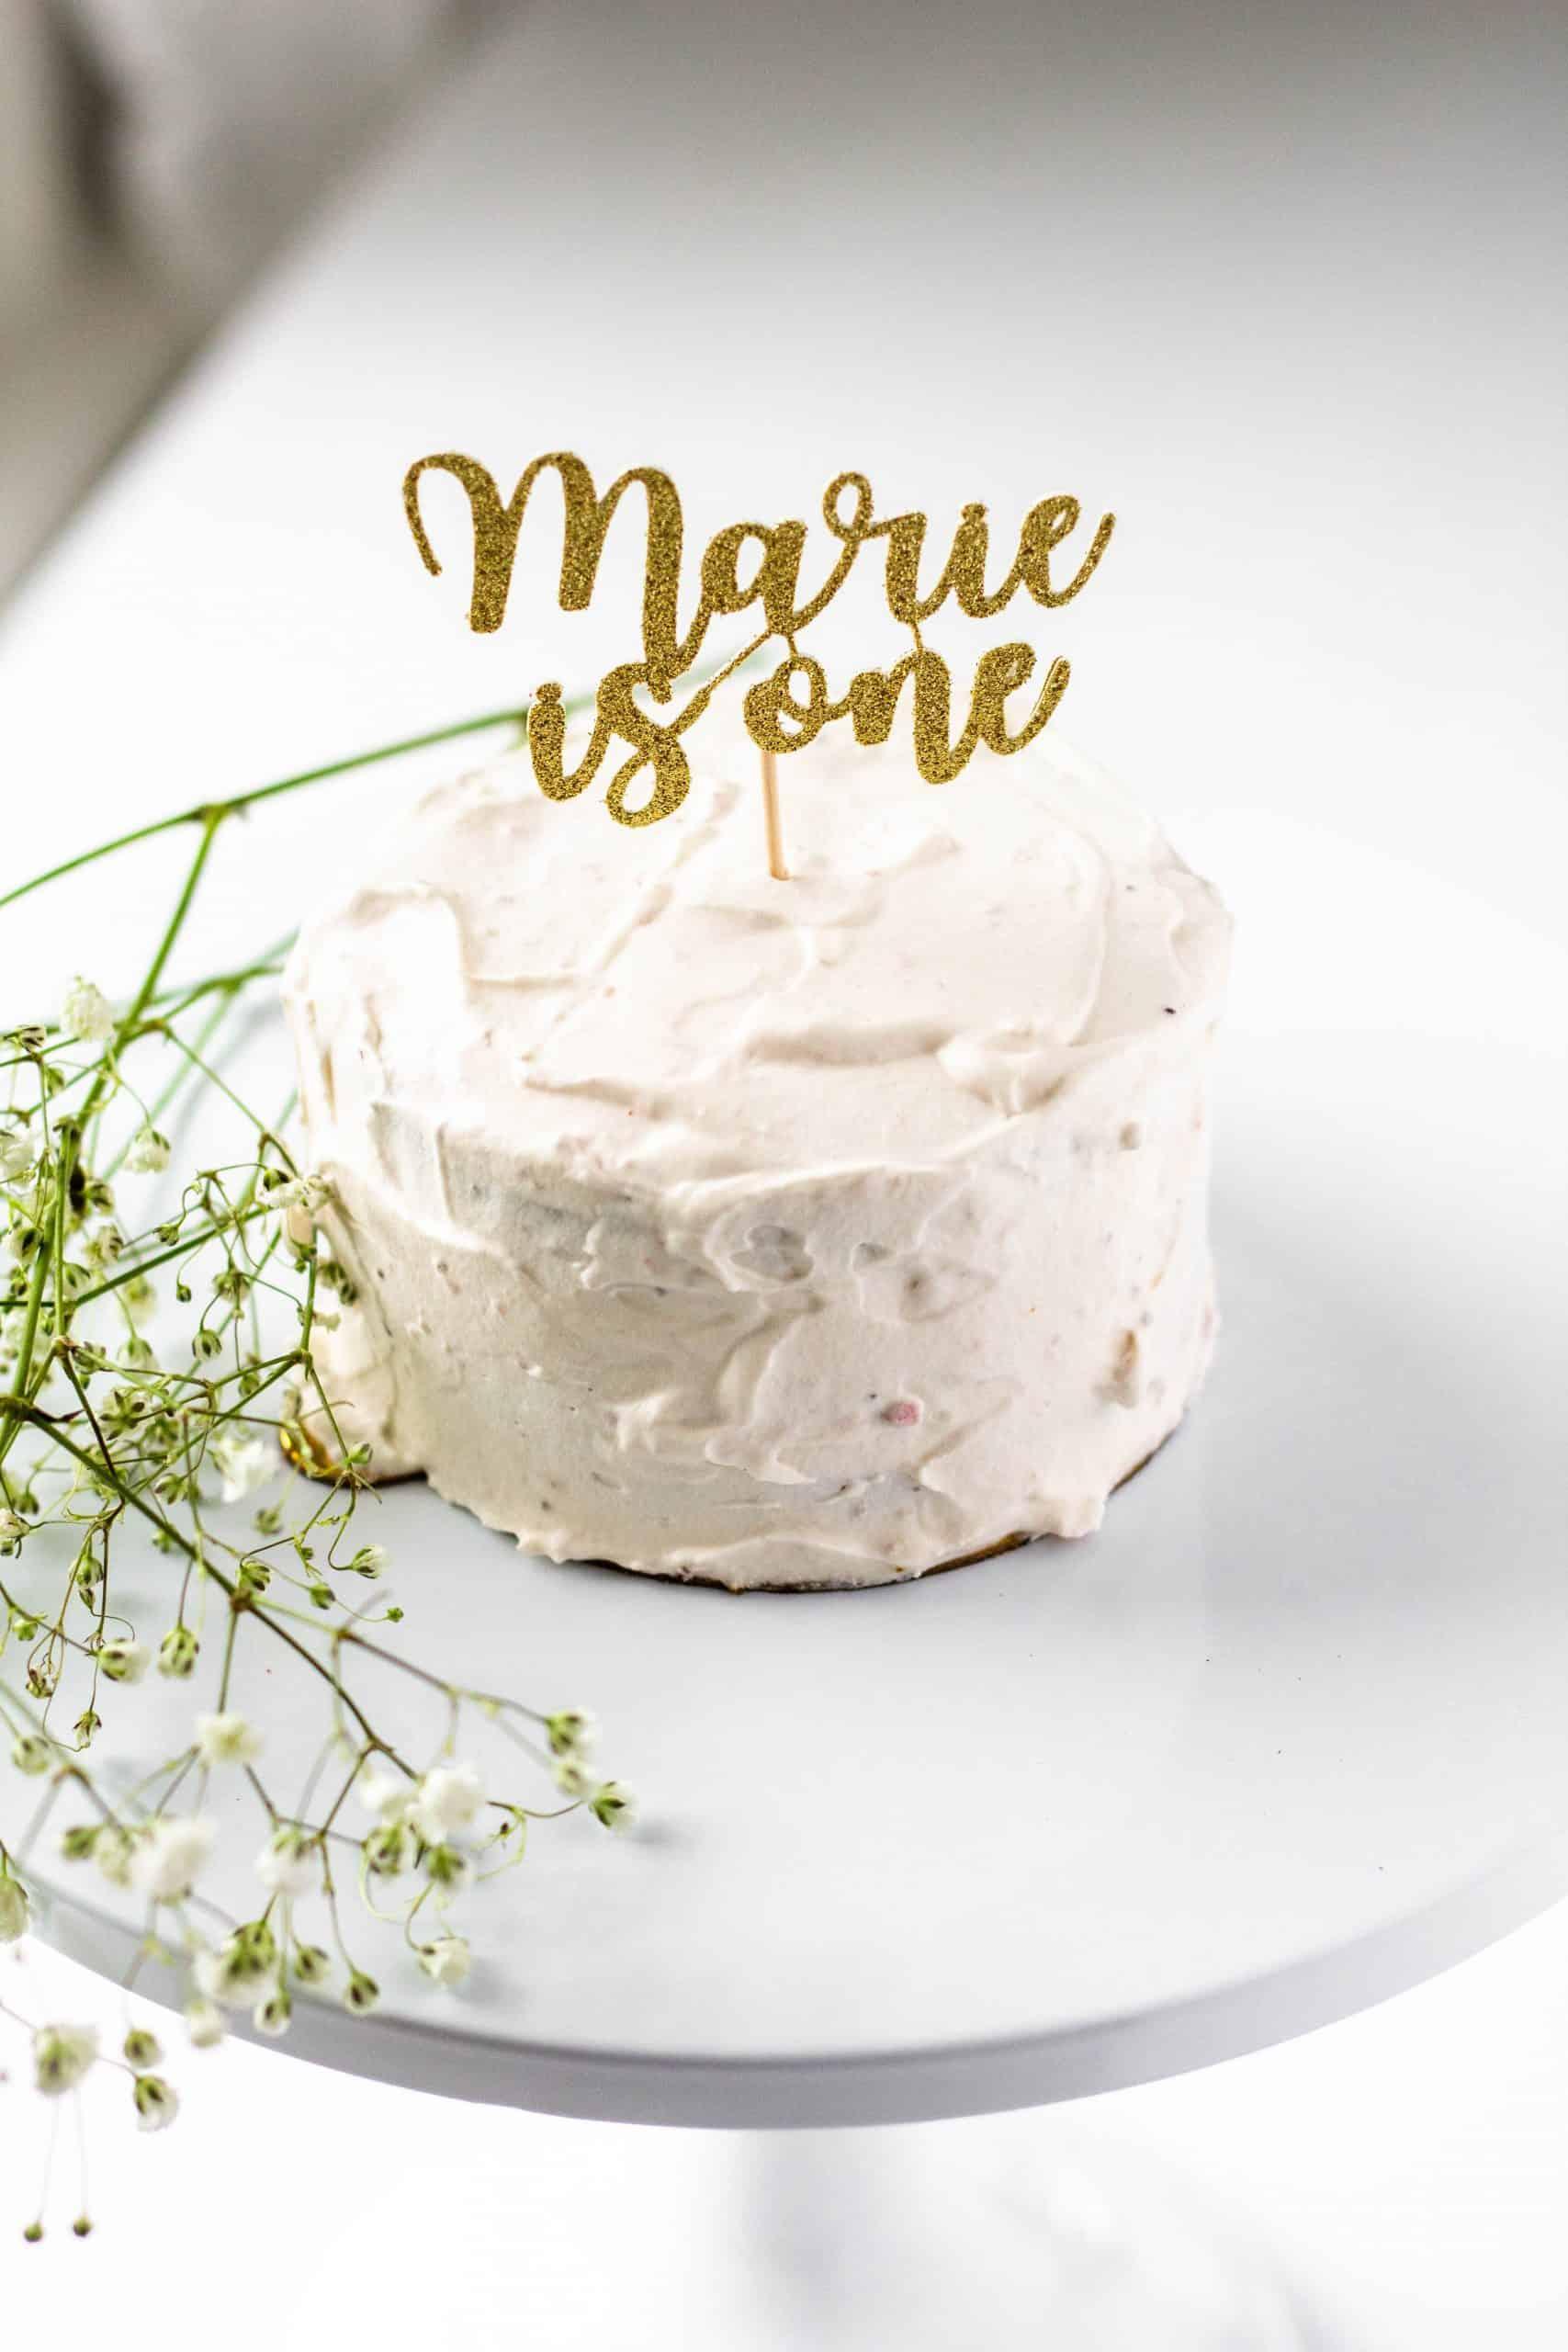 Healthy Smash Cake No Sugar Added #firstbirthday #smashcake #tararochfordnutrition